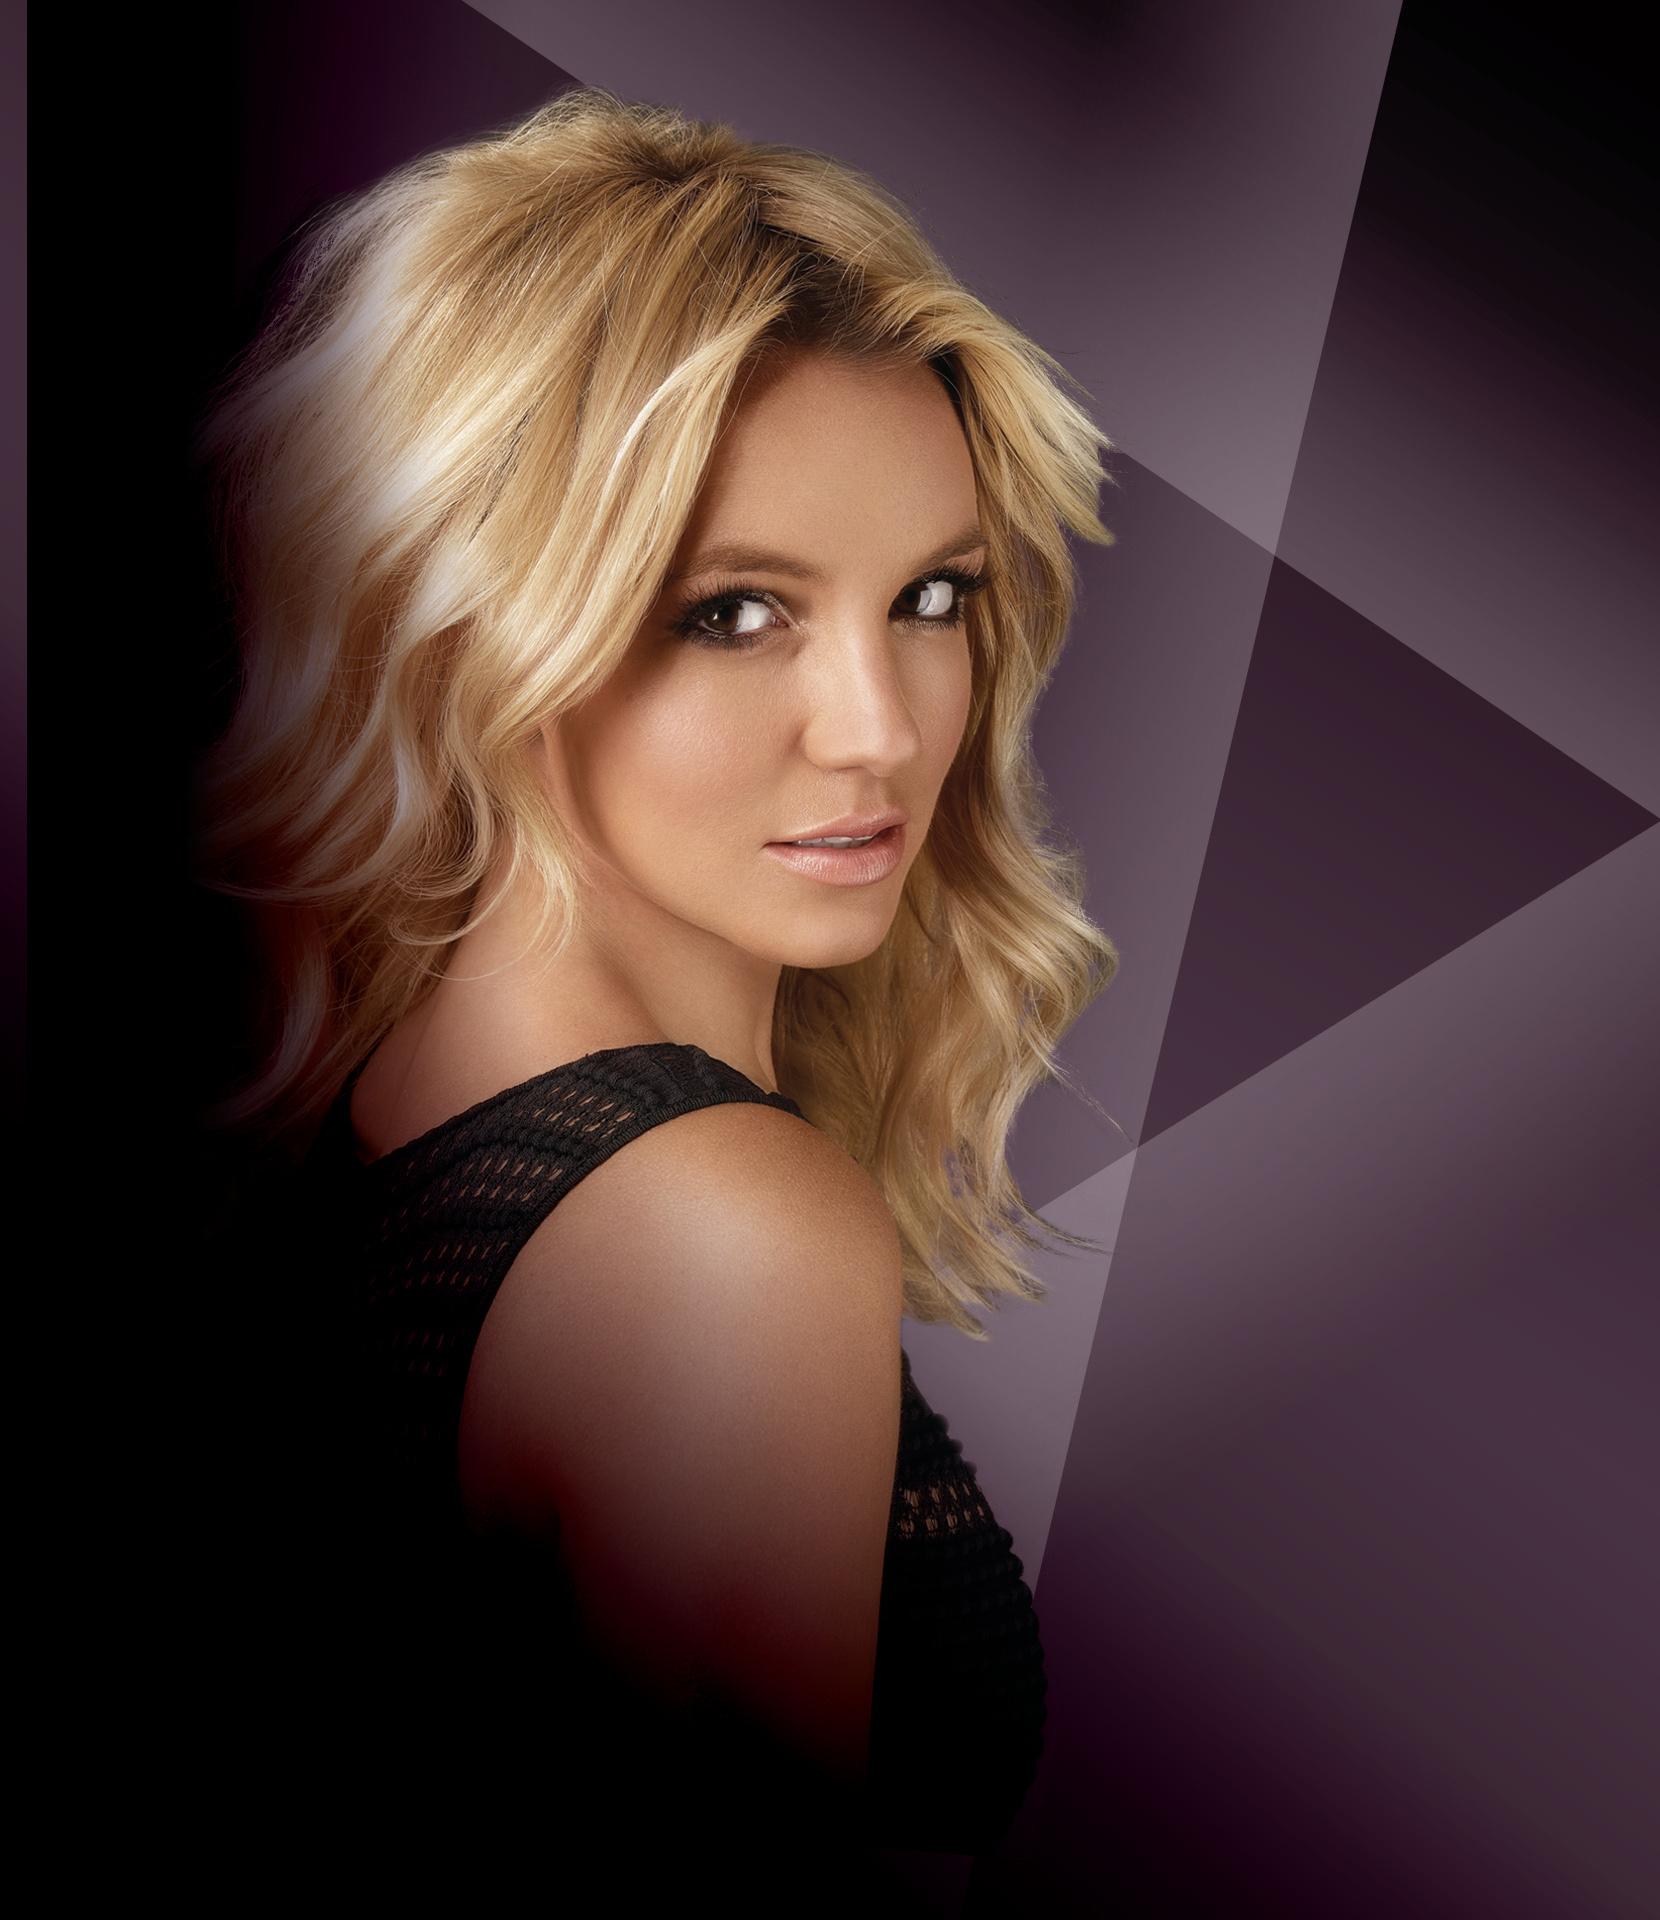 Фотографии Бритни Спирс (Britney Spears) Подборка фотографий (866